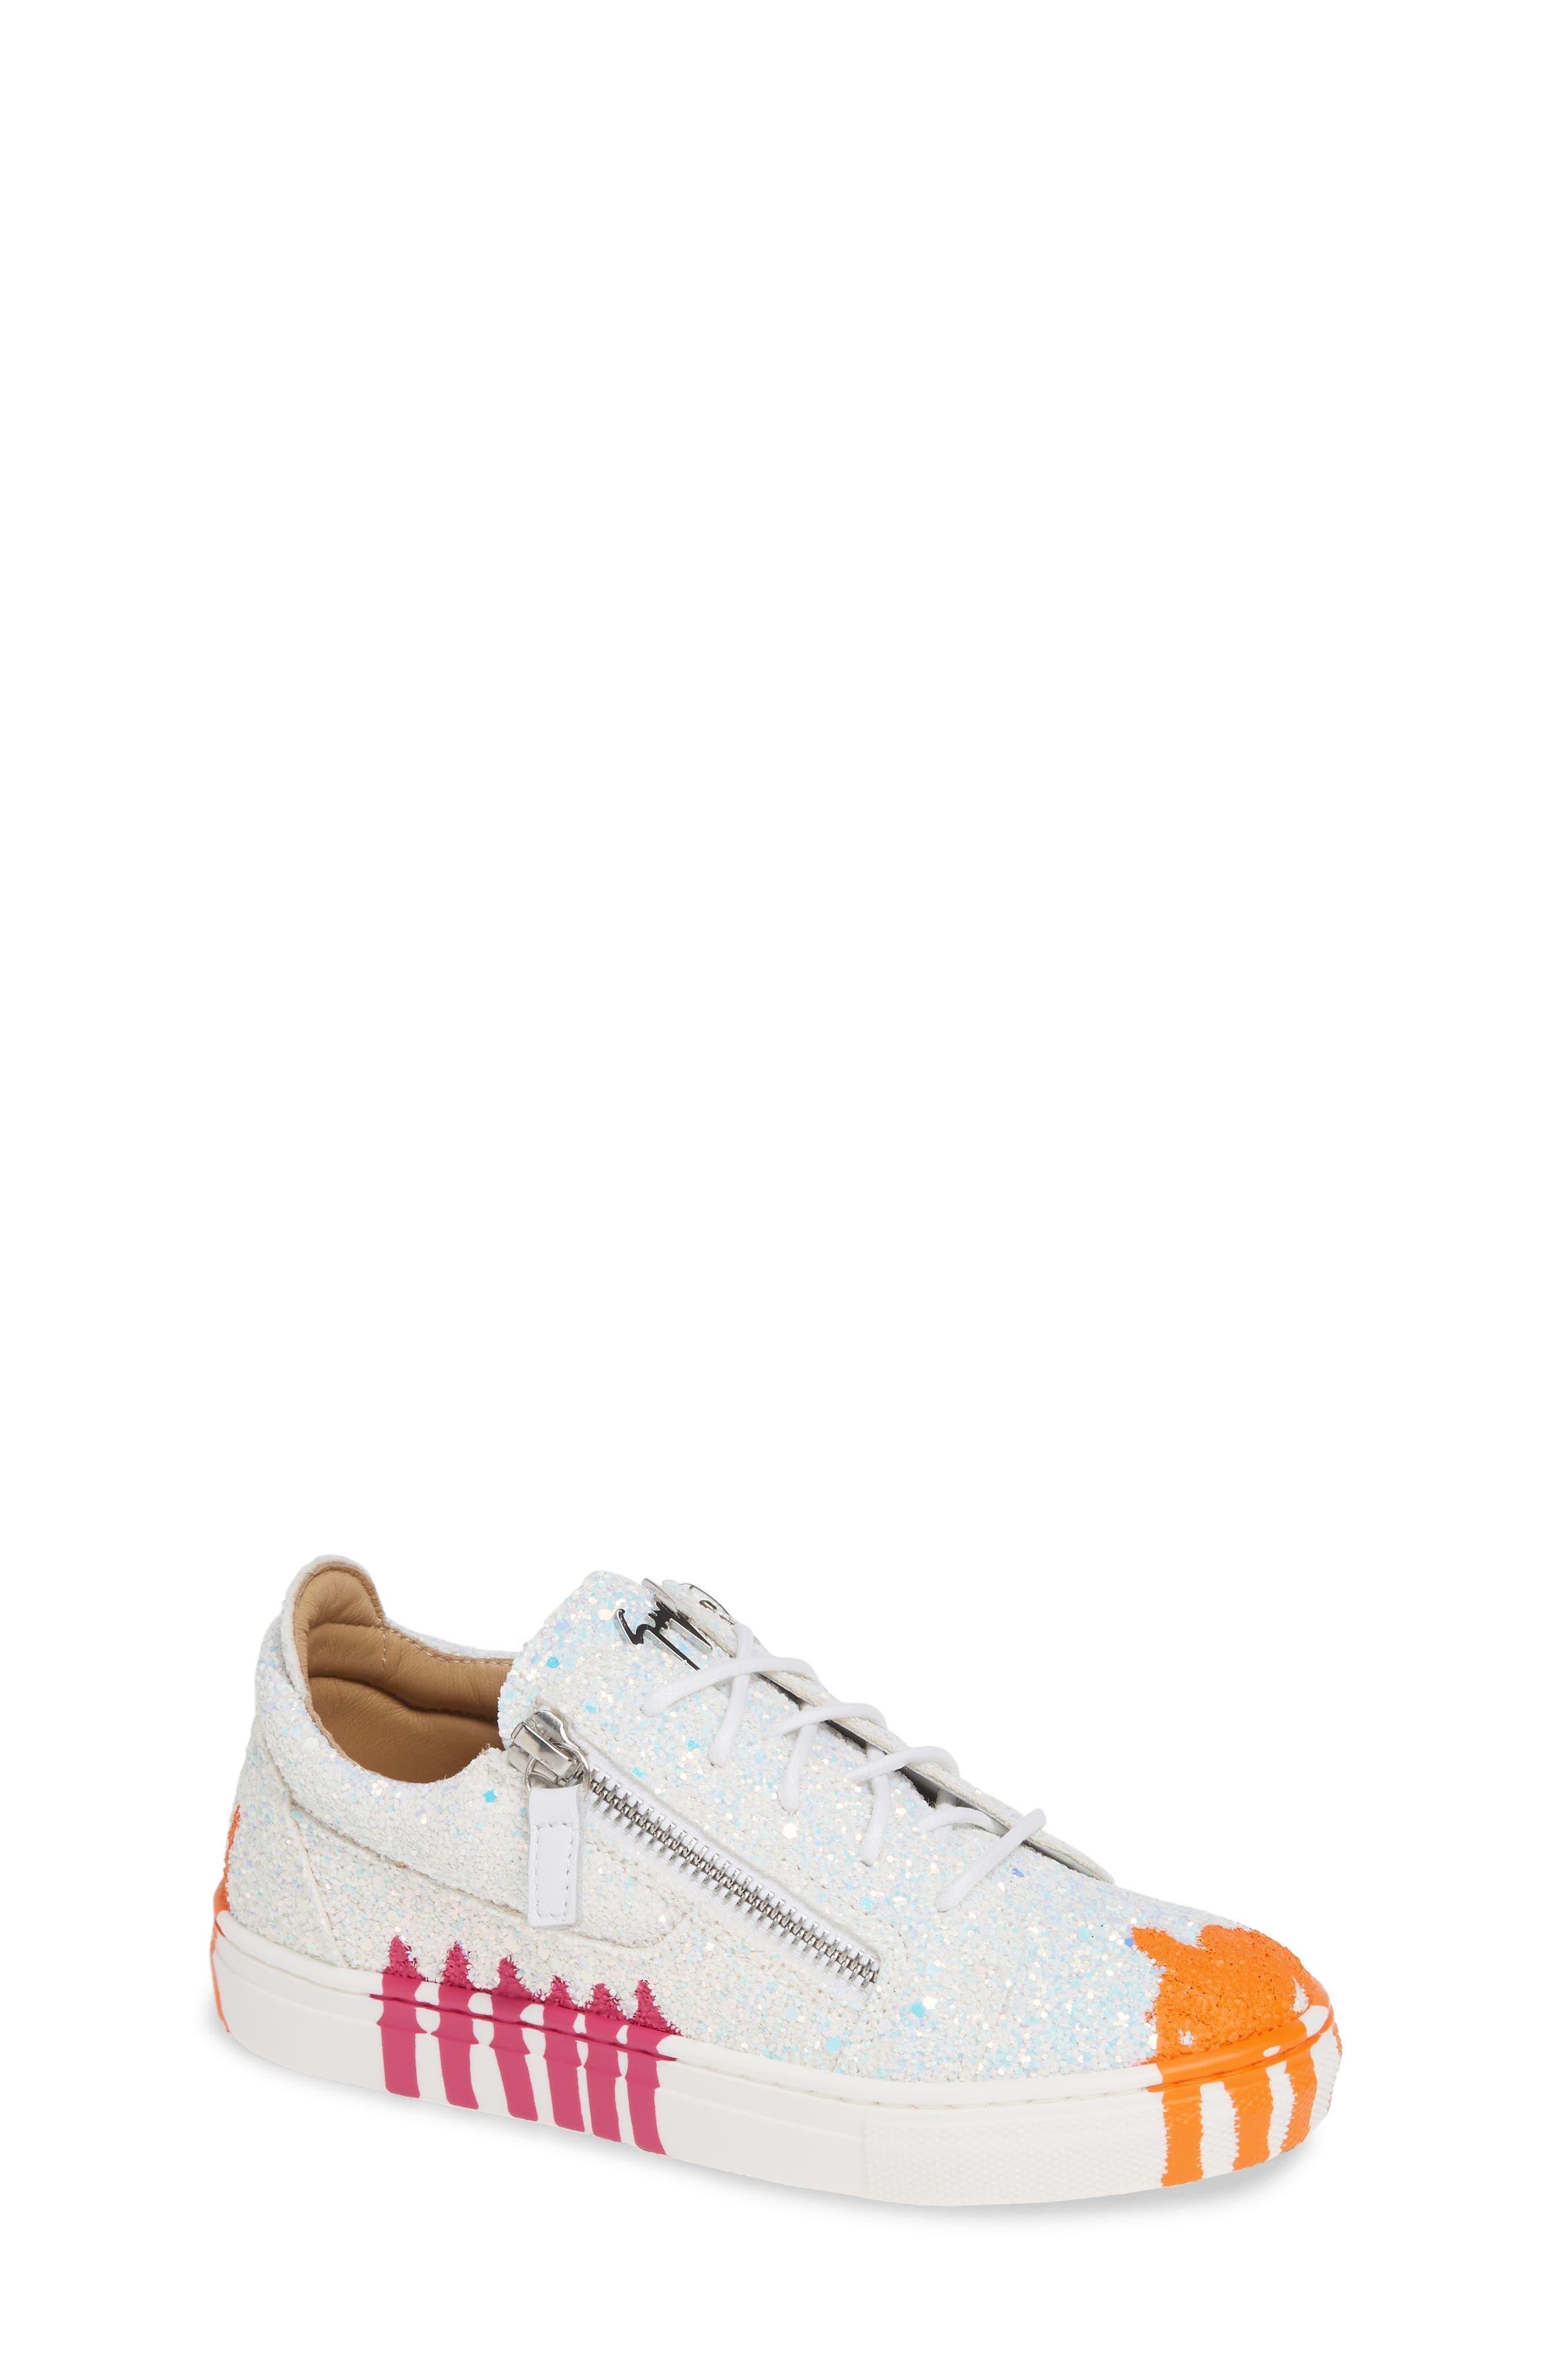 GIUSEPPE ZANOTTI London Glitter Sneaker, Main, color, MILK